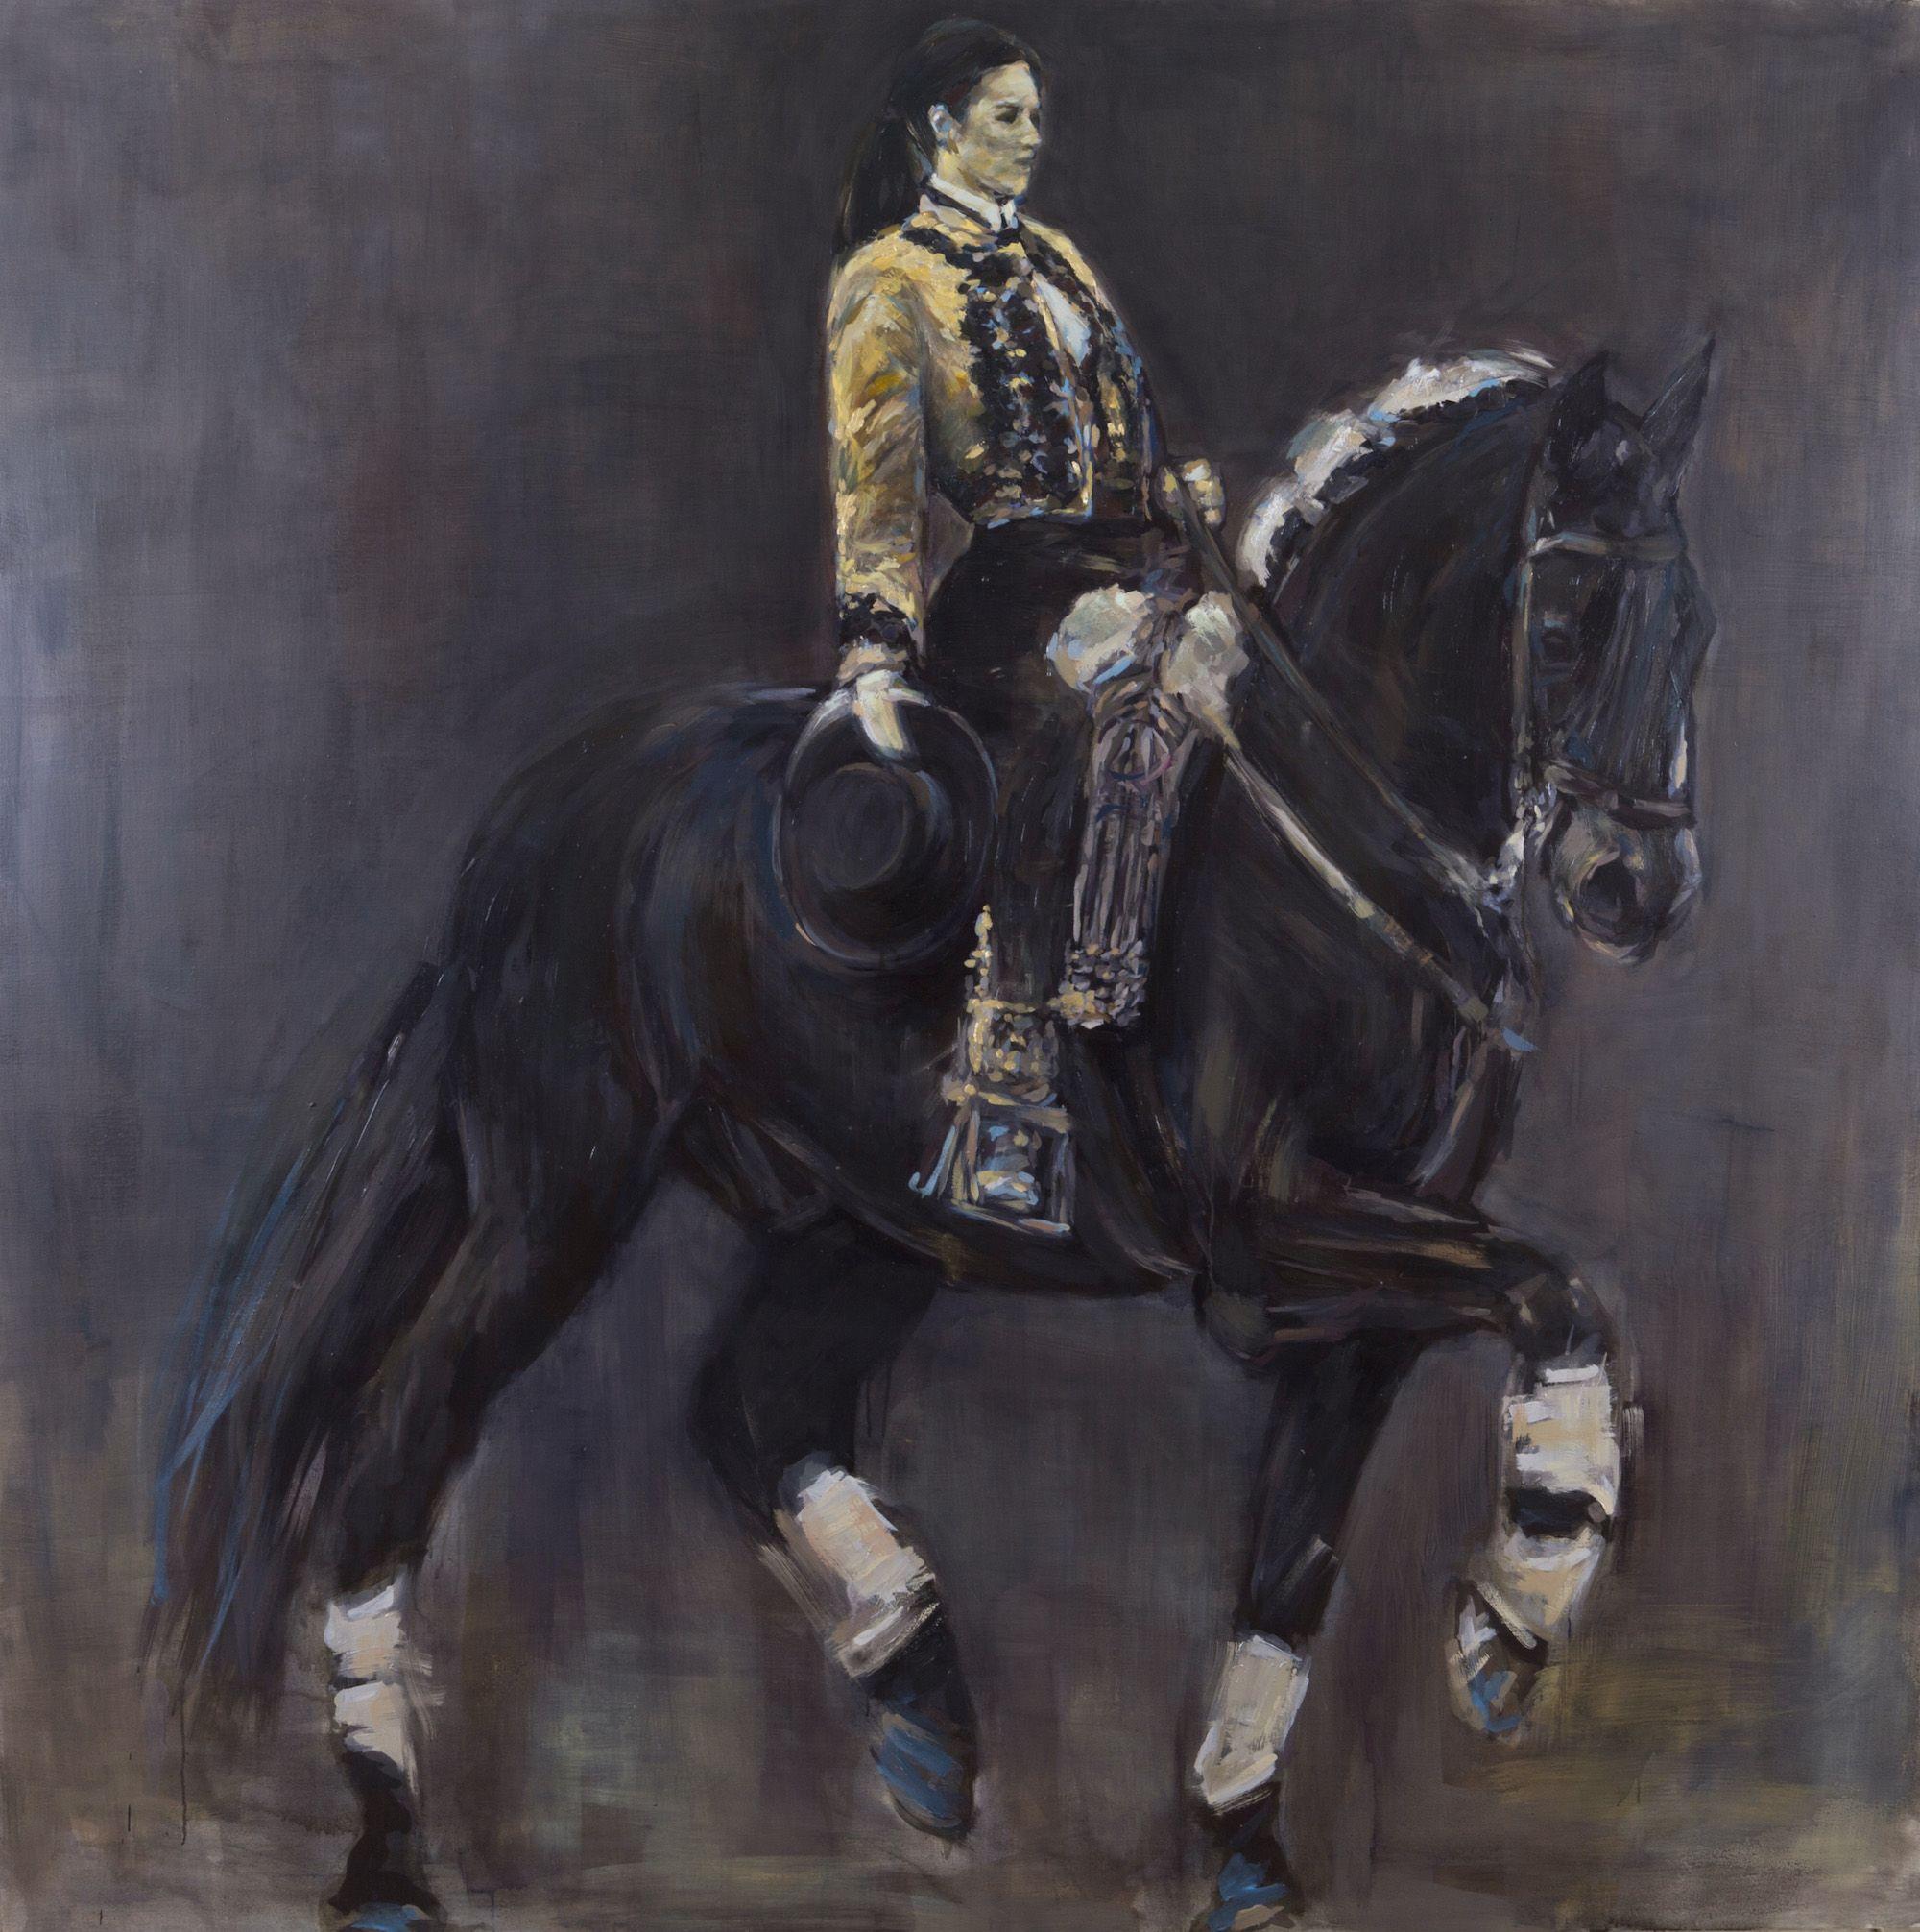 Monica Serrano Oil On Canvas 180cmx180cm